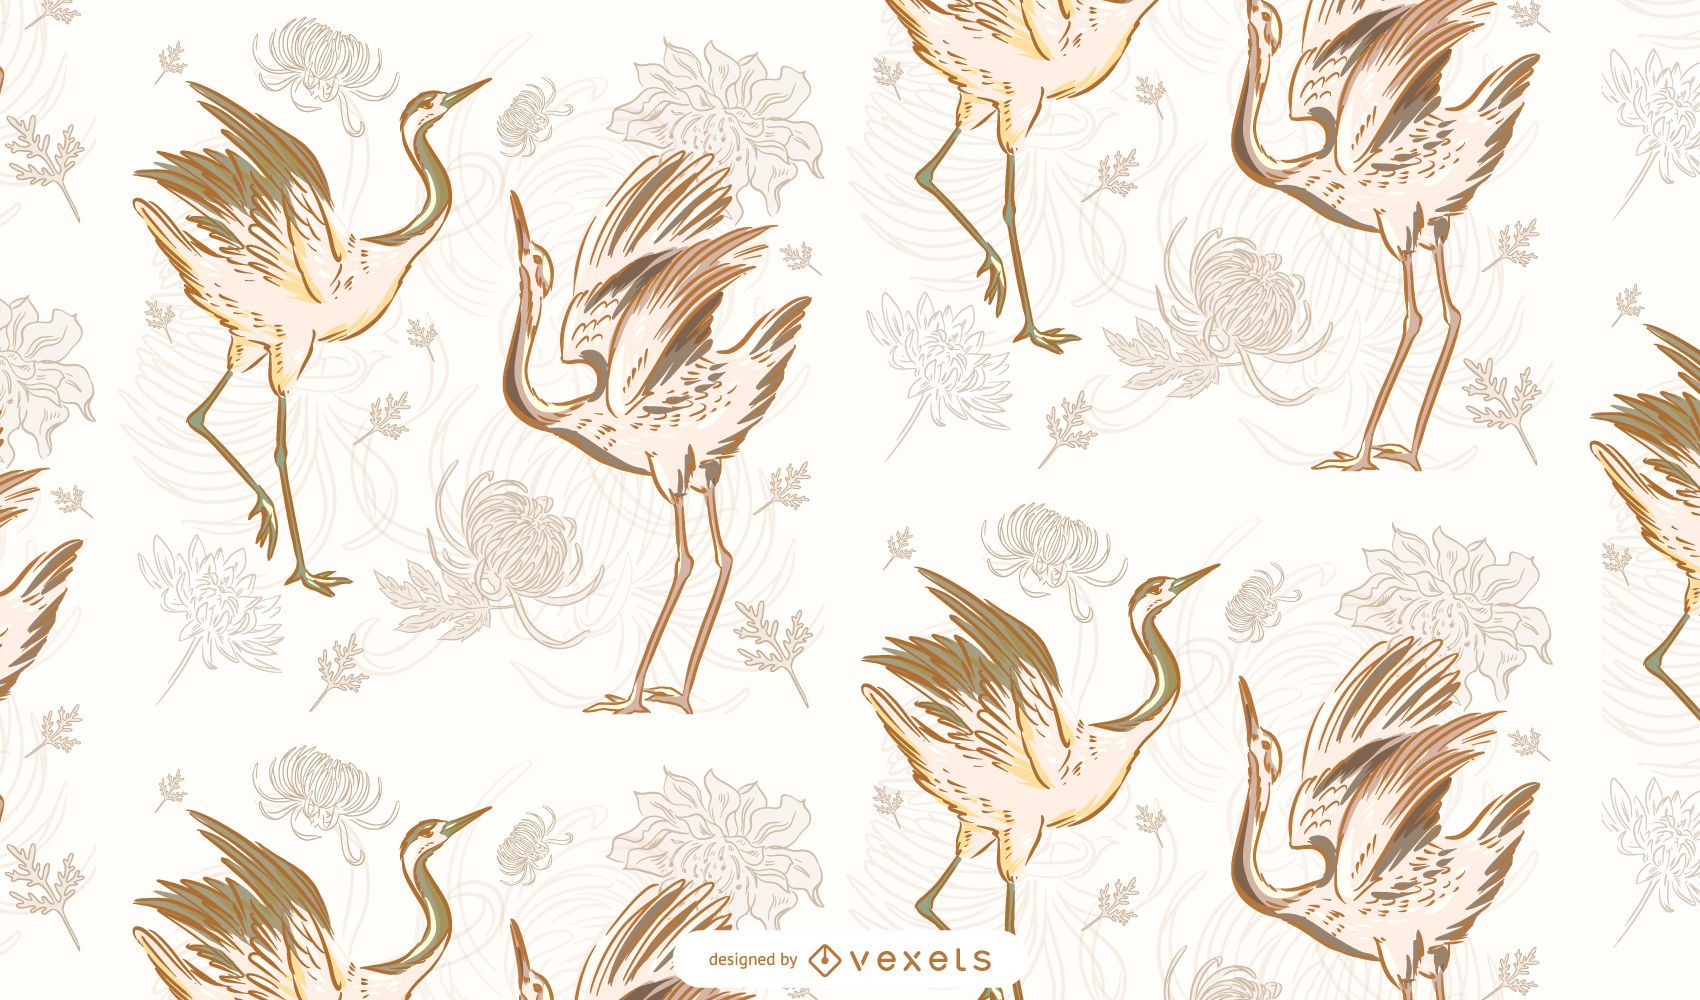 Chinese cranes pattern design